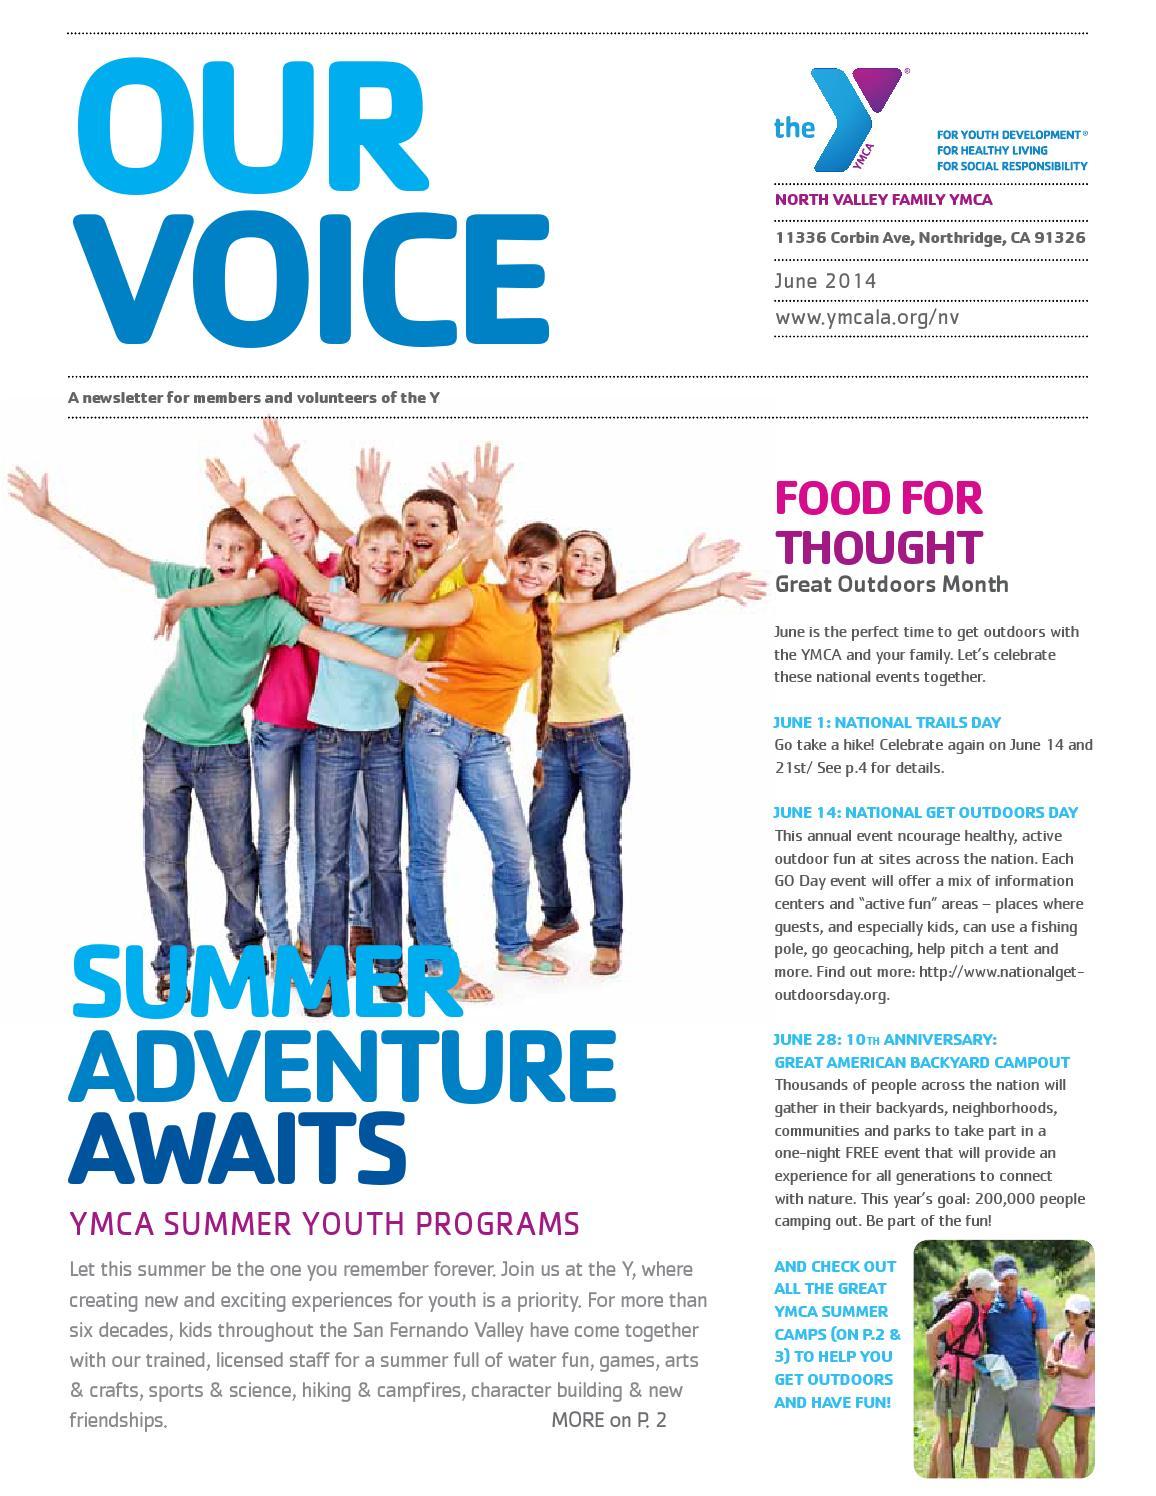 north valley family ymca june newsletter by ymca of metropolitan